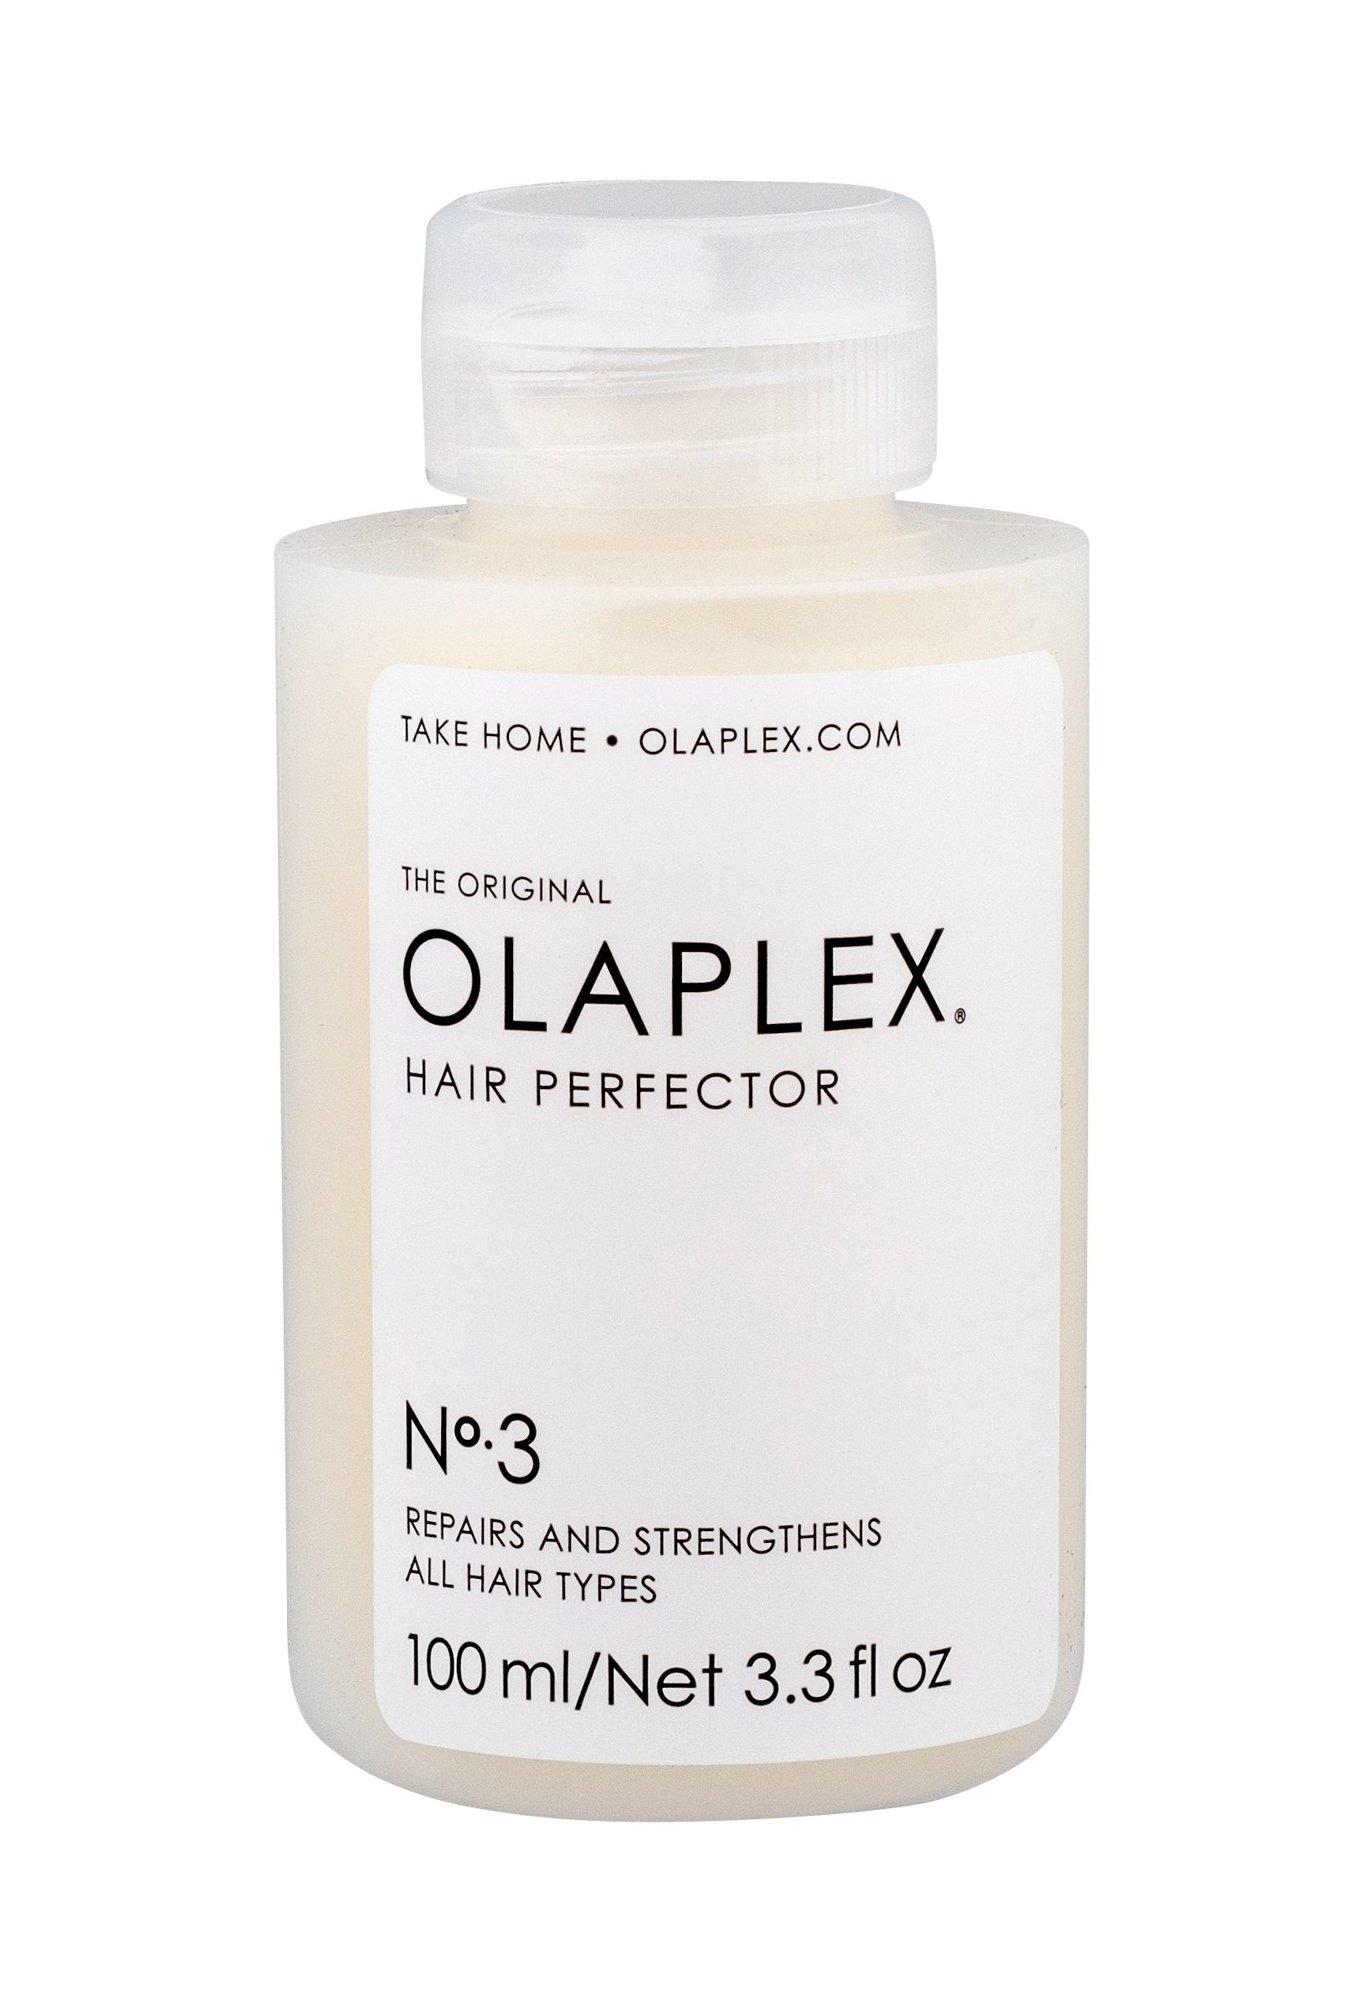 Olaplex Hair Perfector No. 3 Cosmetic 100ml